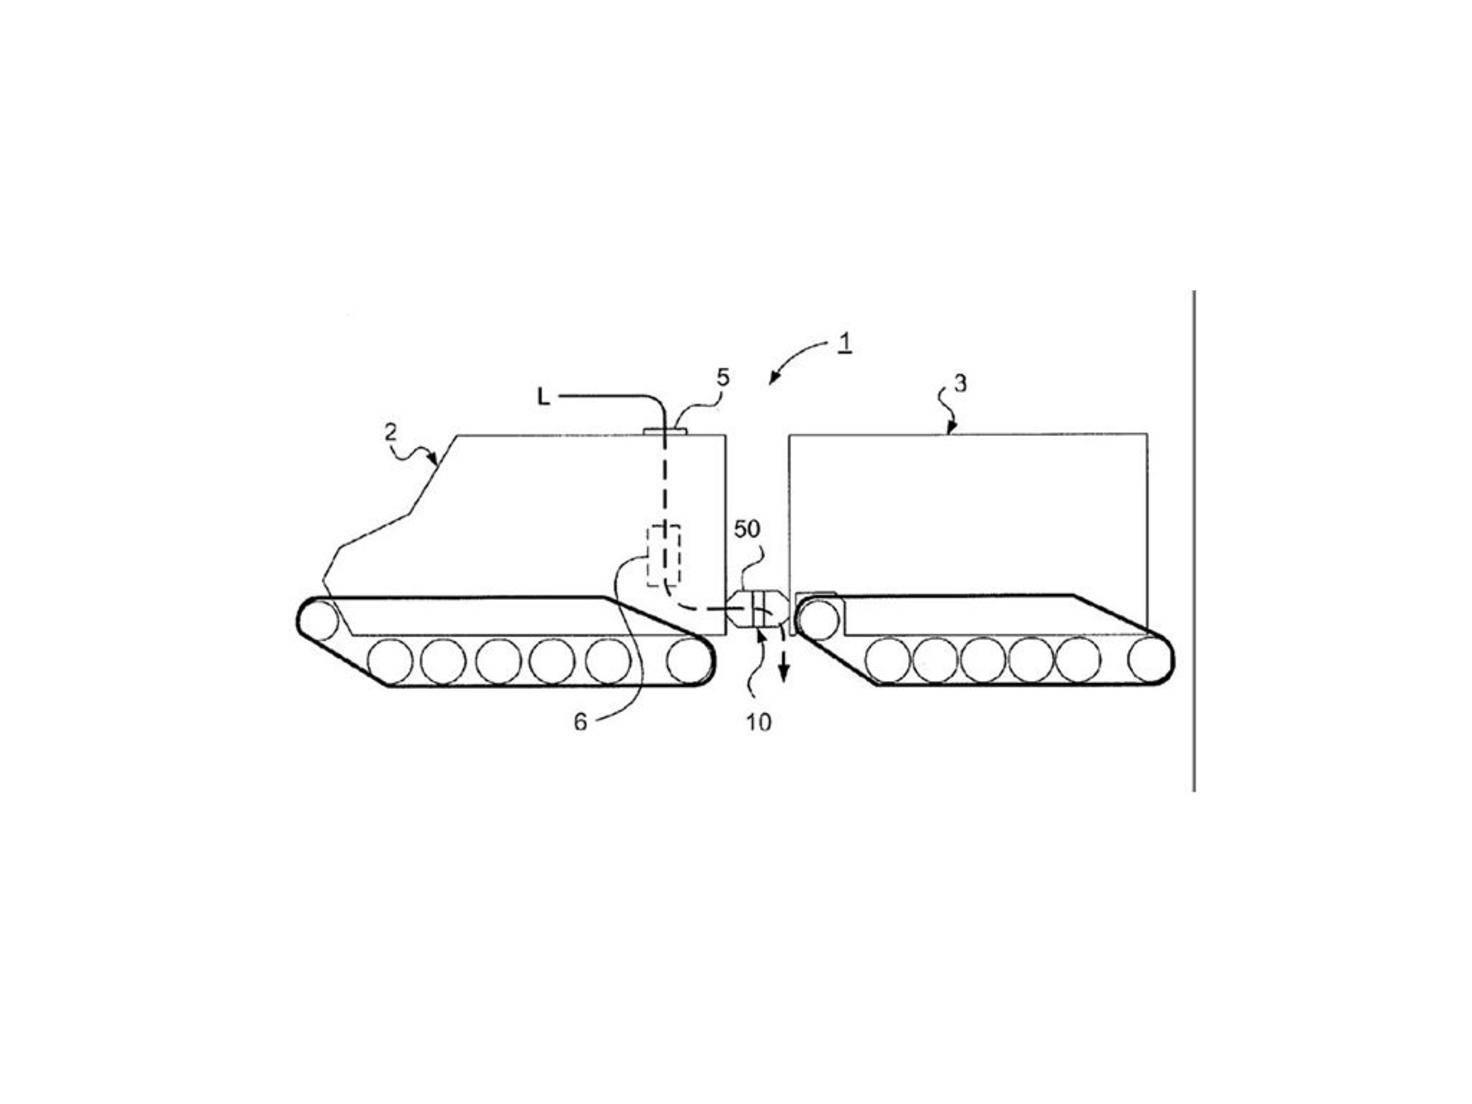 Apple Car Patent